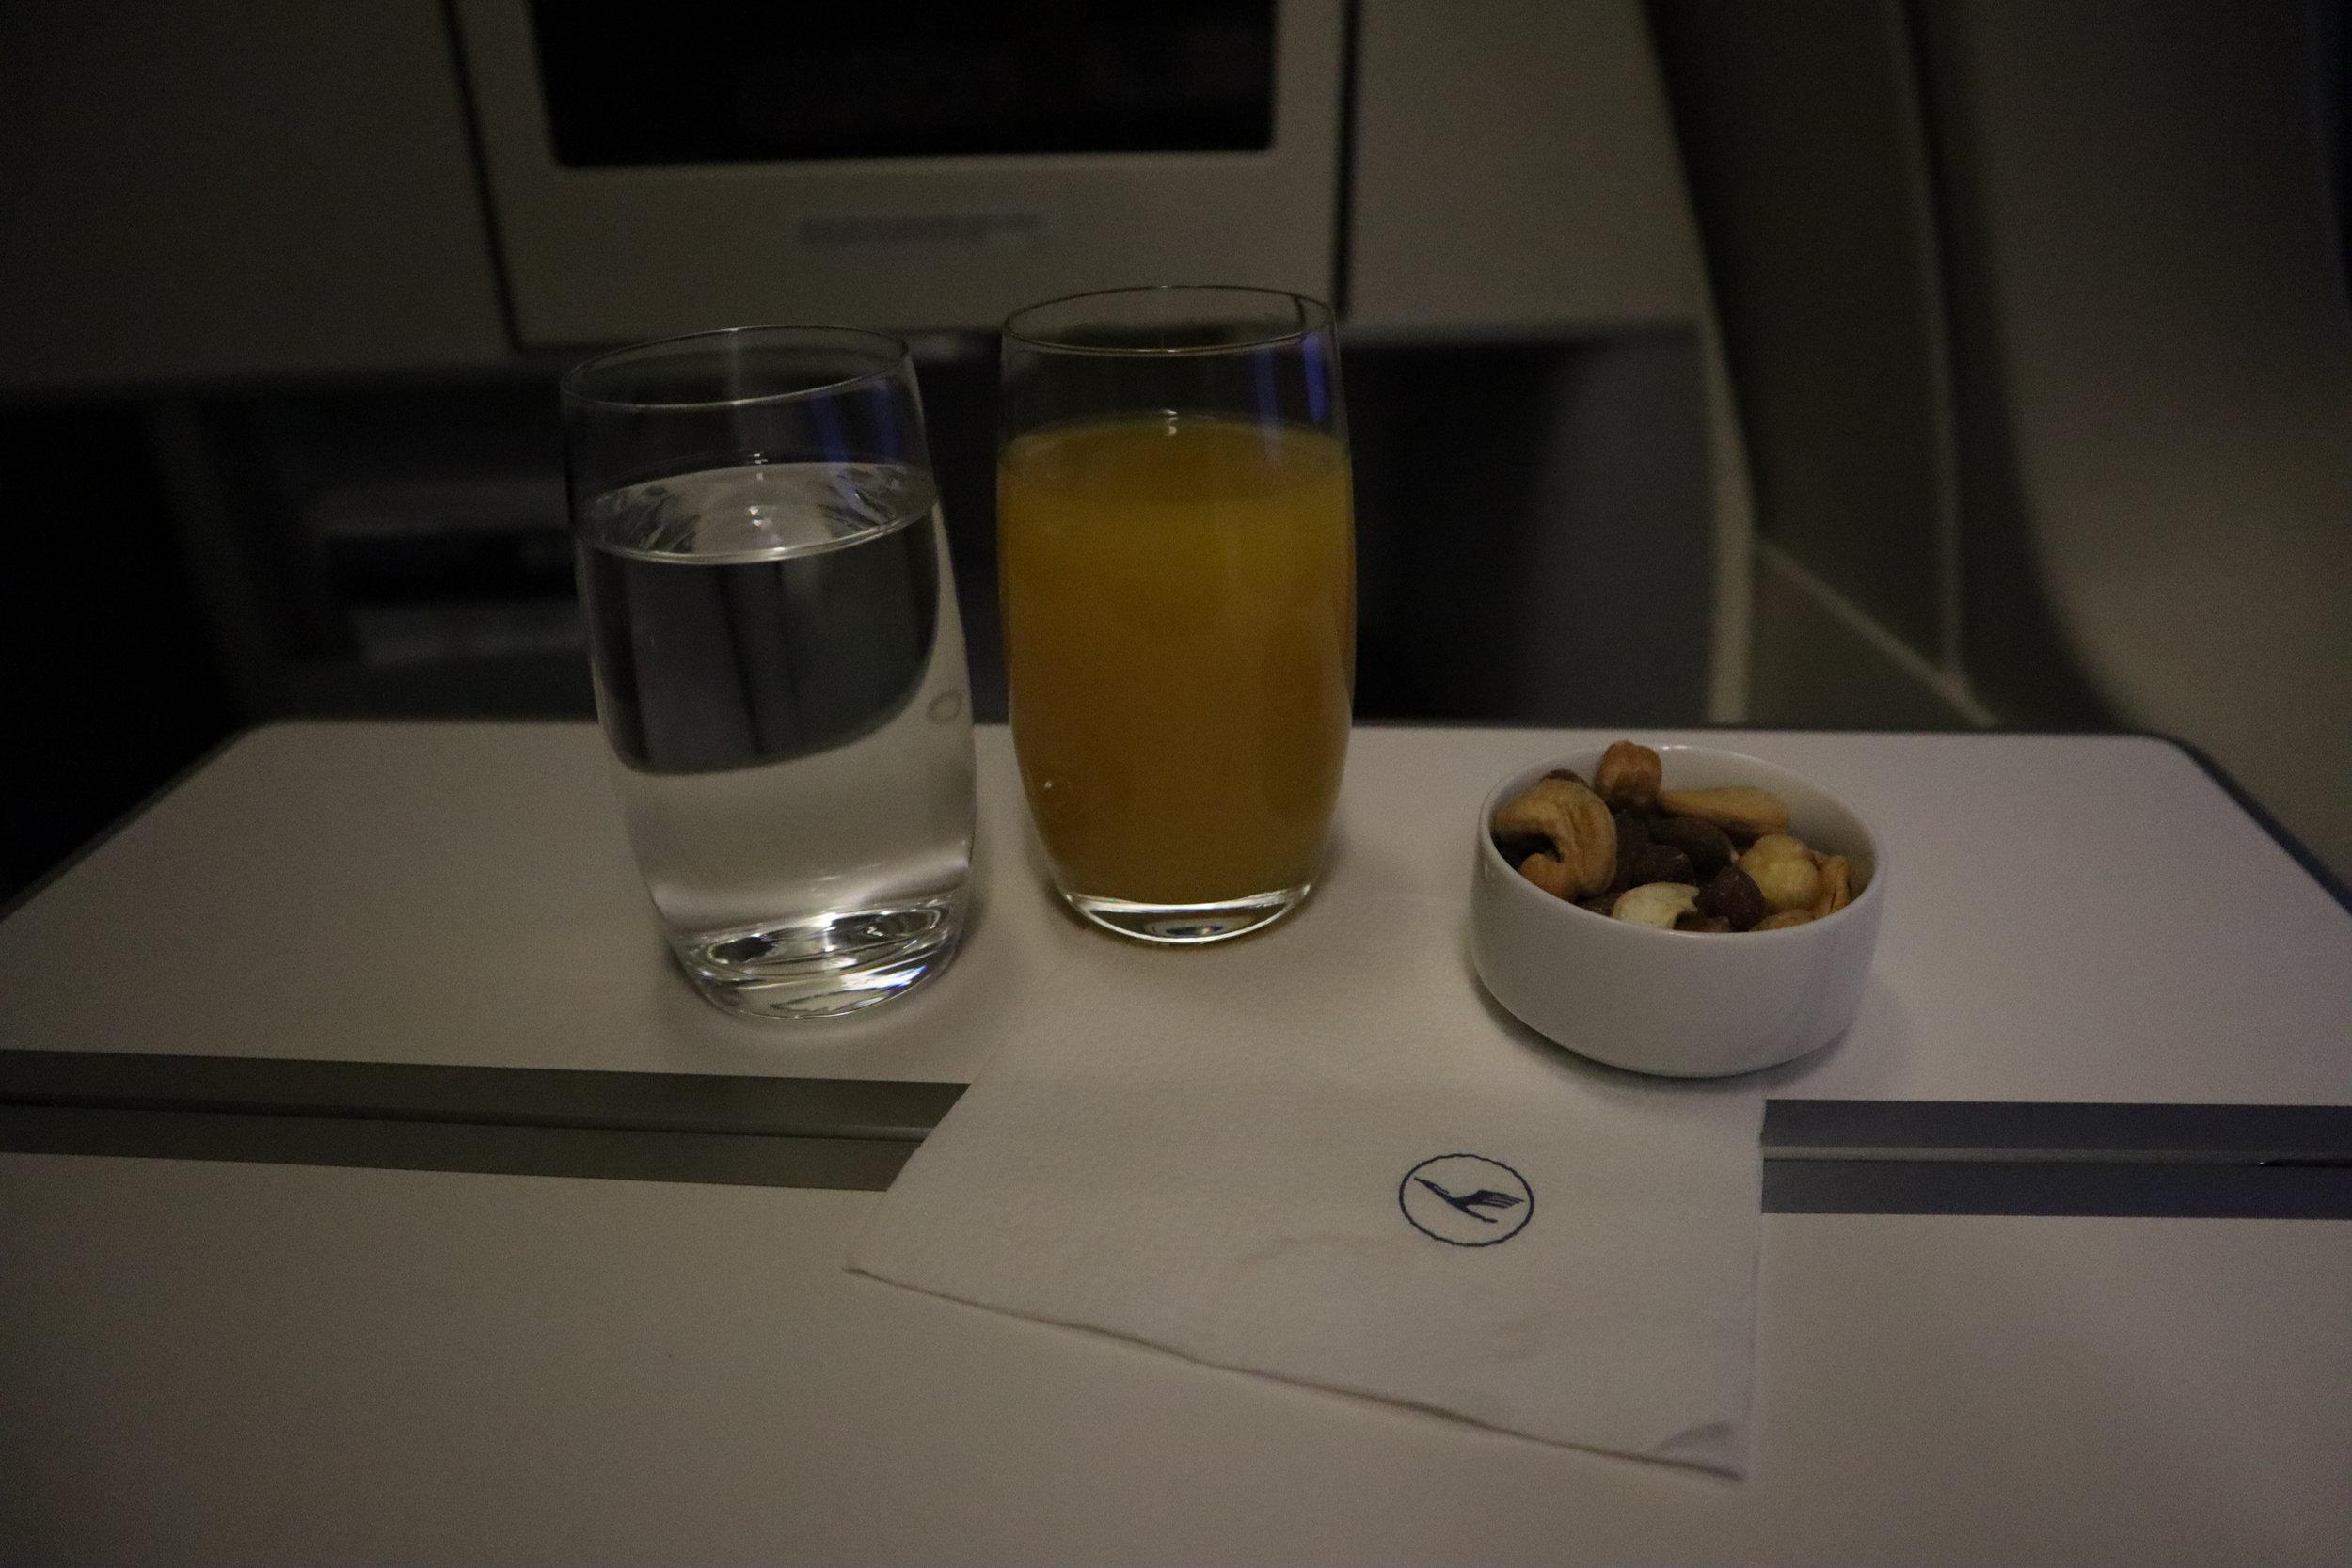 Lufthansa 747-400 business class – Orange juice